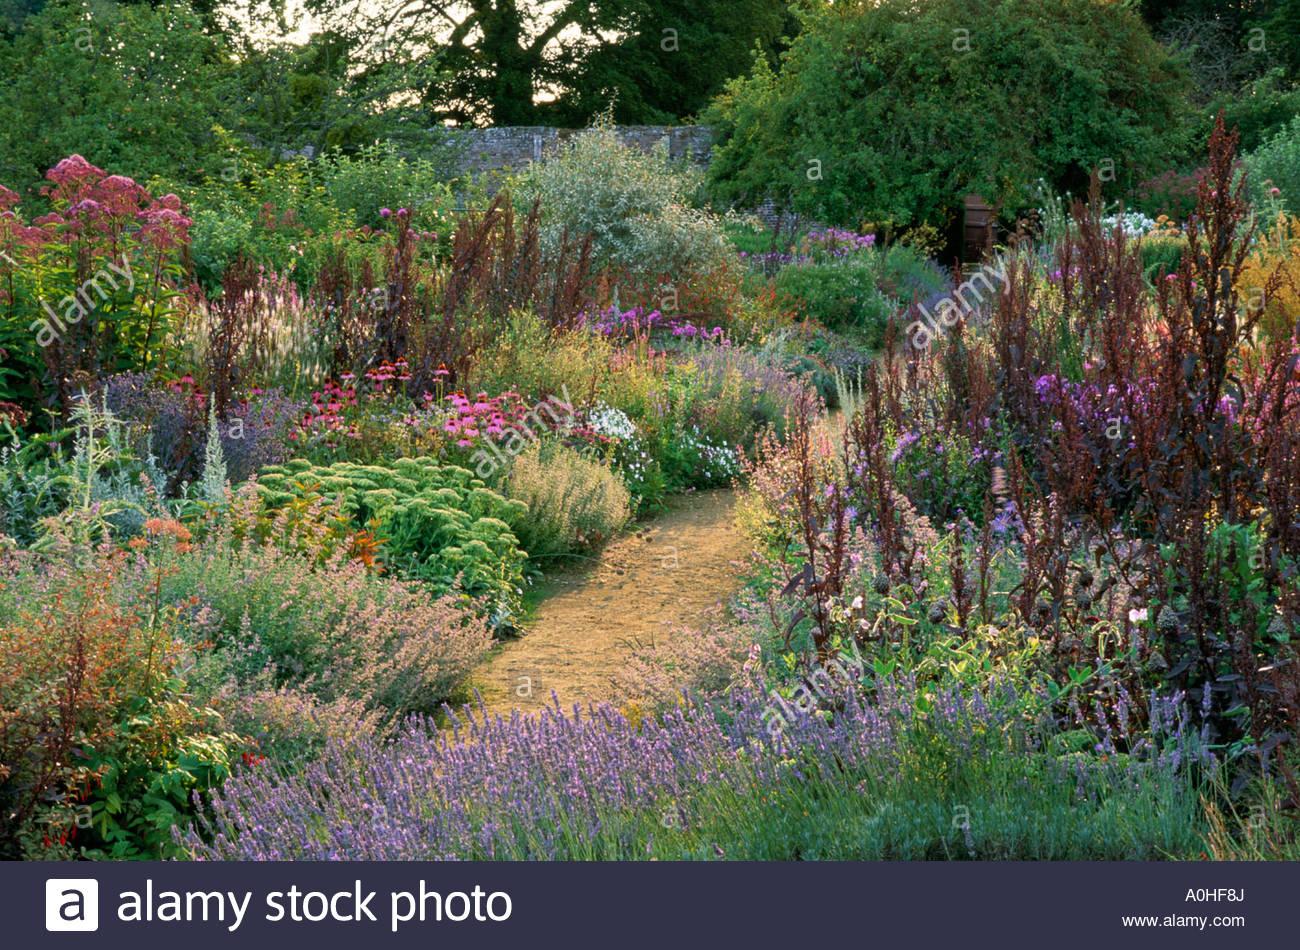 parham sussex staudenrabatten im sommer lavendel echinacea. Black Bedroom Furniture Sets. Home Design Ideas